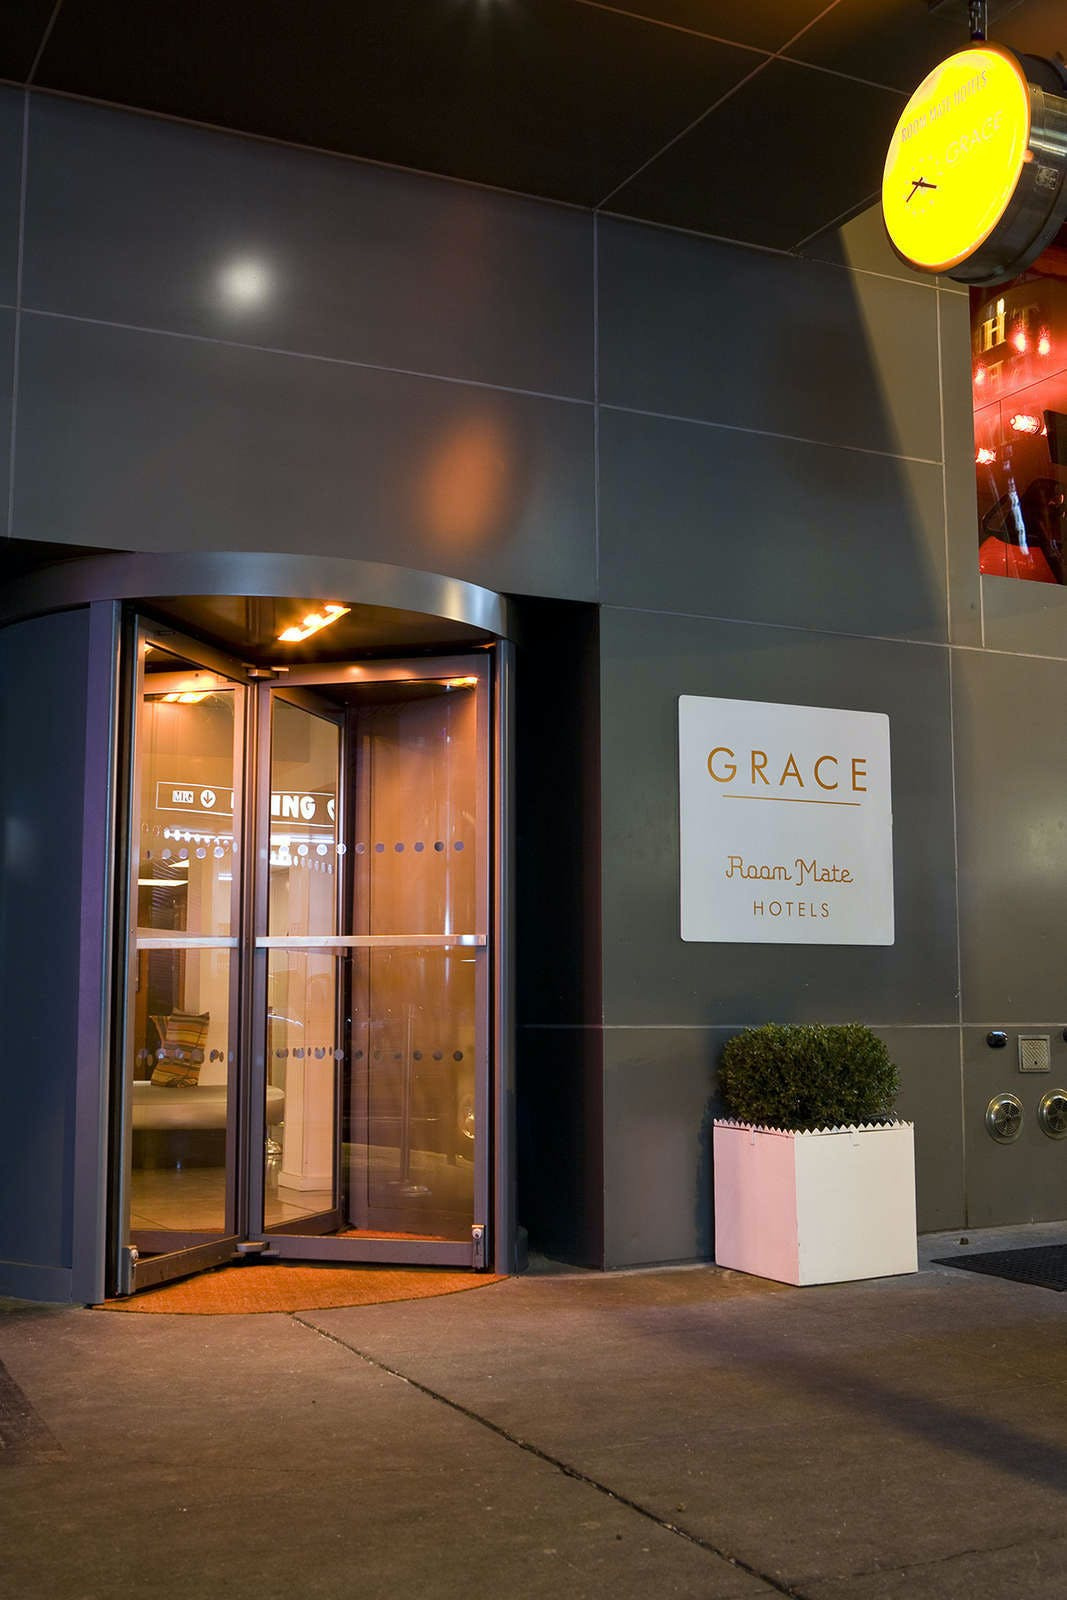 Room Mate Grace